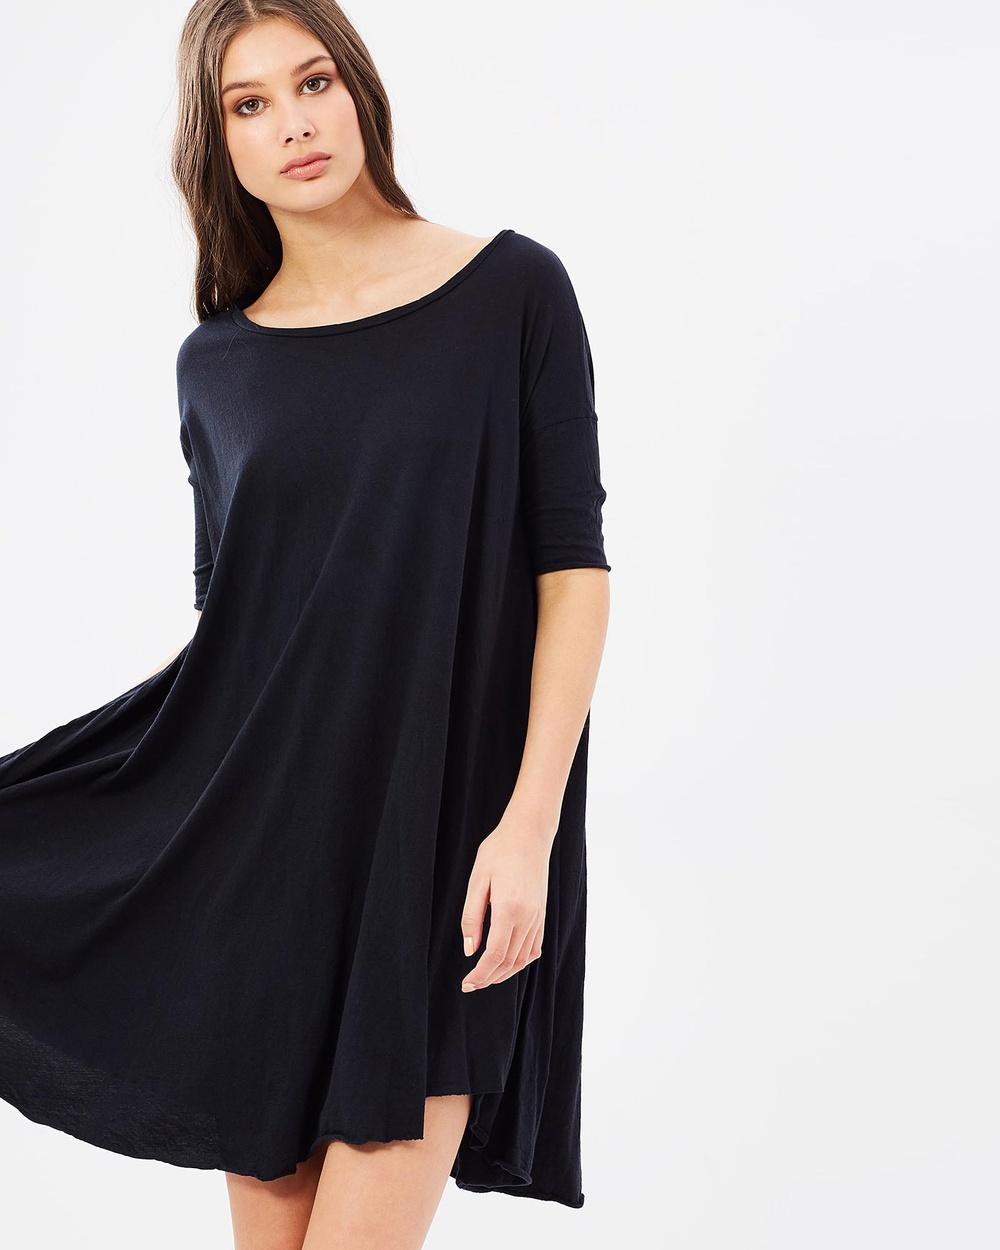 Primness Pop Dress Dresses Black Pop Dress